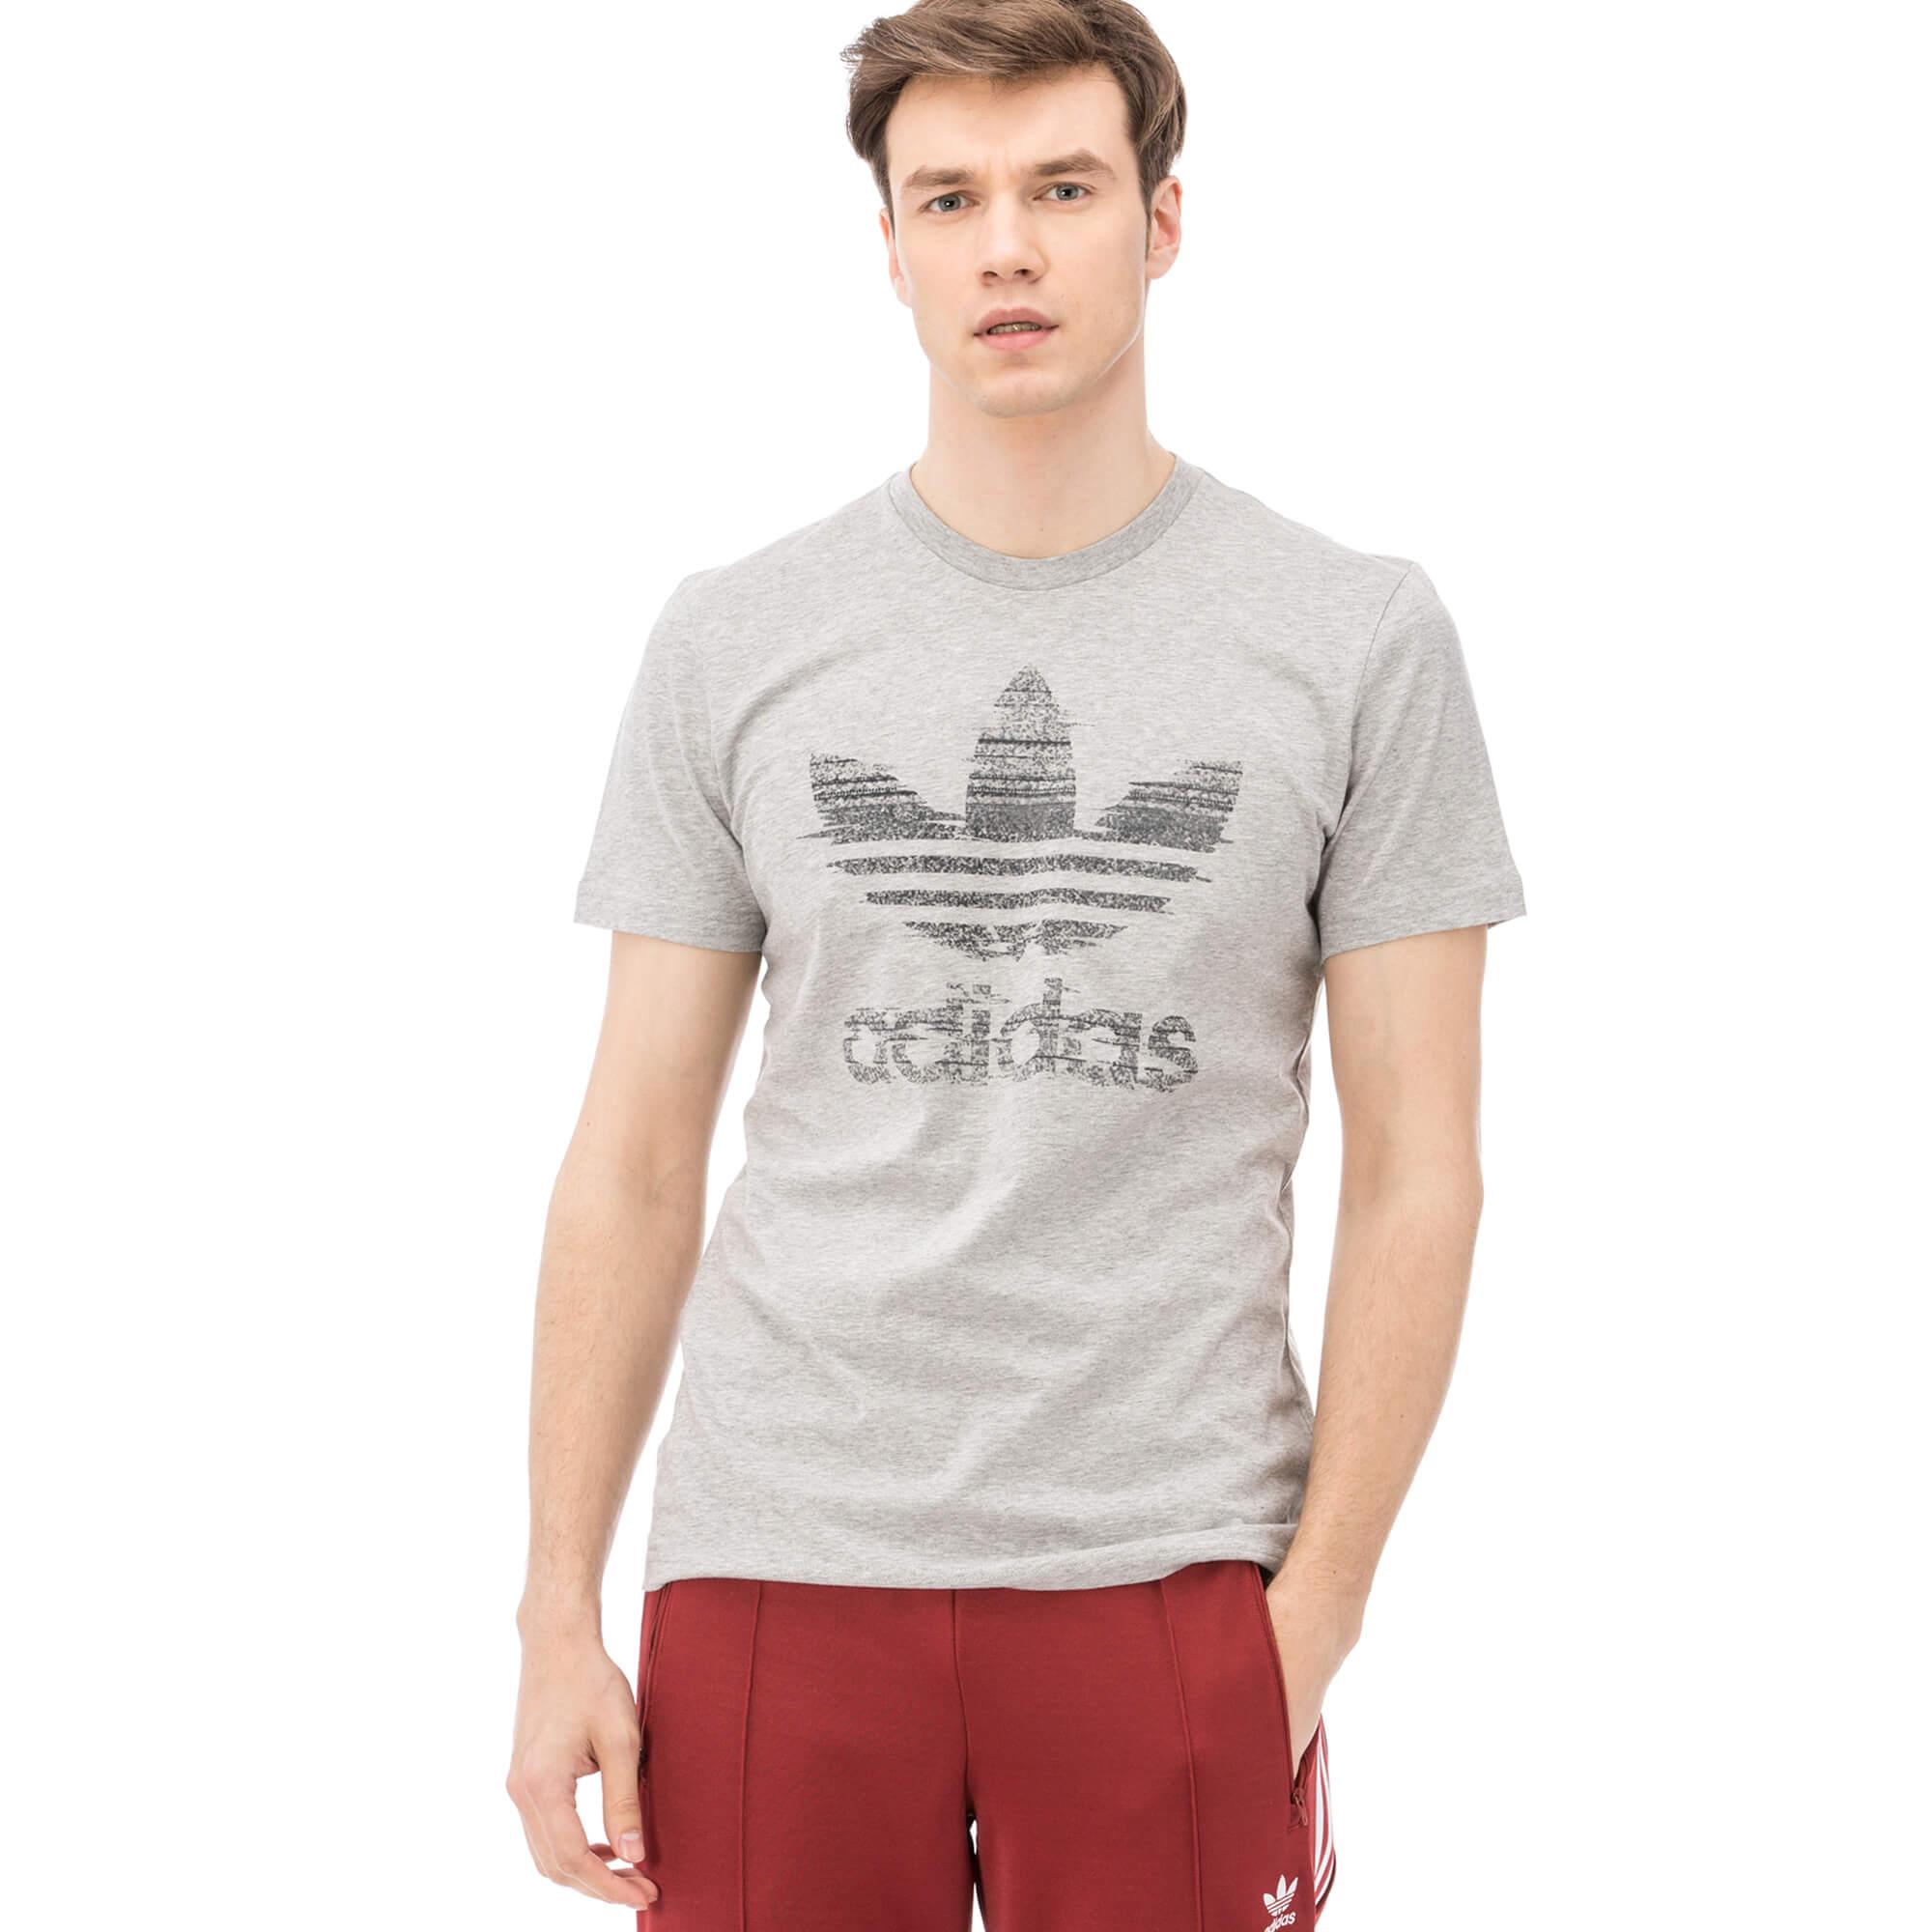 adidas Traction Trefoil Erkek Gri Tshirt